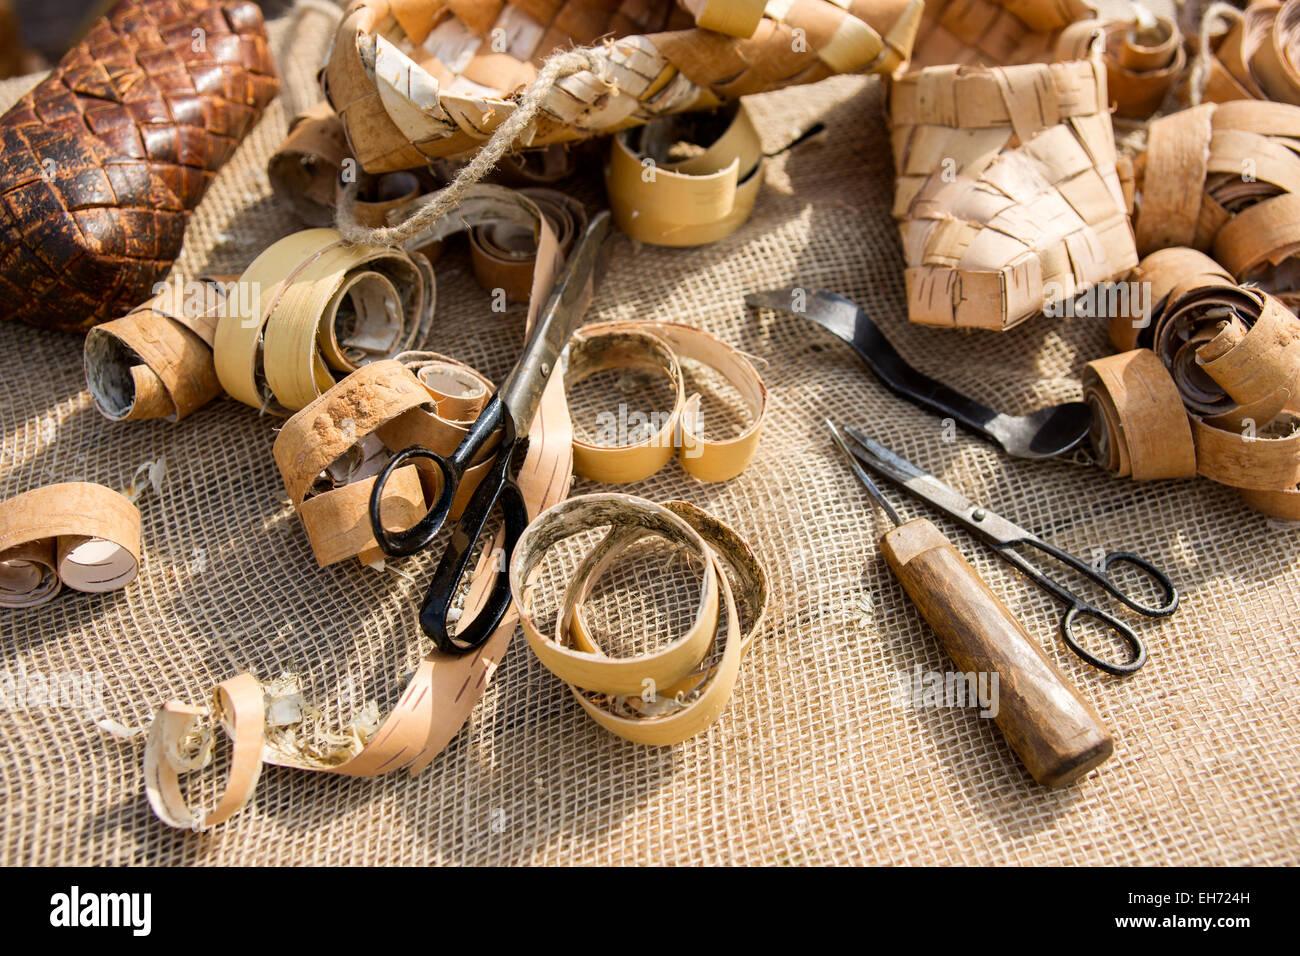 Russian Bast Shoes Immagini   Russian Bast Shoes Fotos Stock - Alamy 3988167cc0b